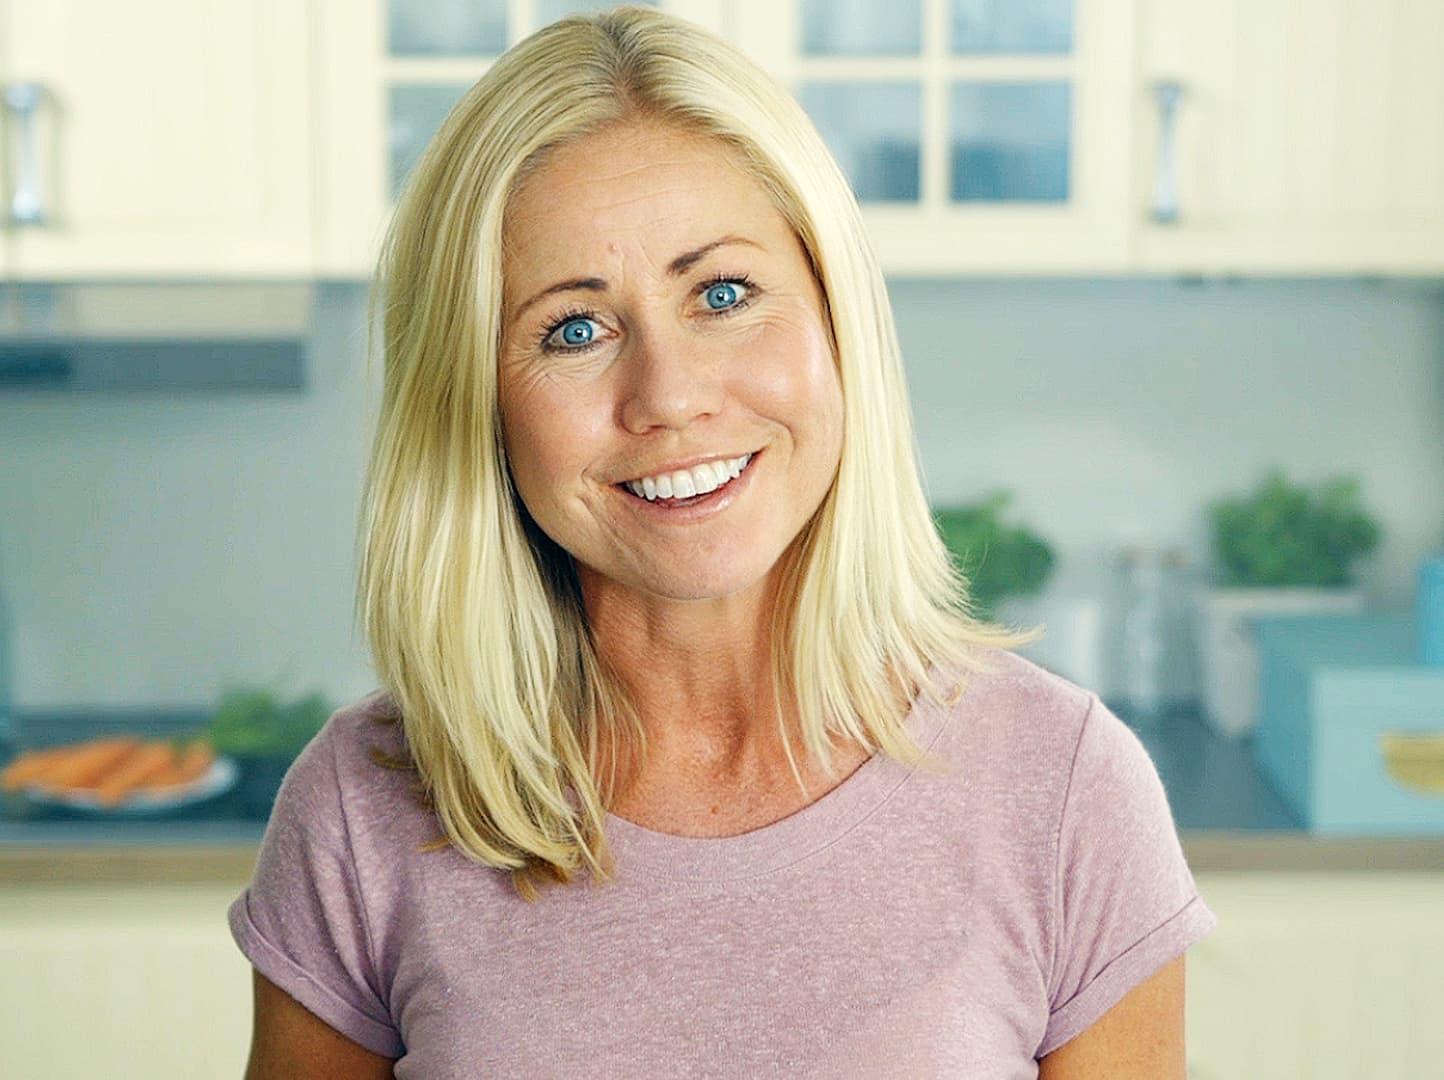 Få tips fra klinisk ernæringsfysiolog Tine Sundfør